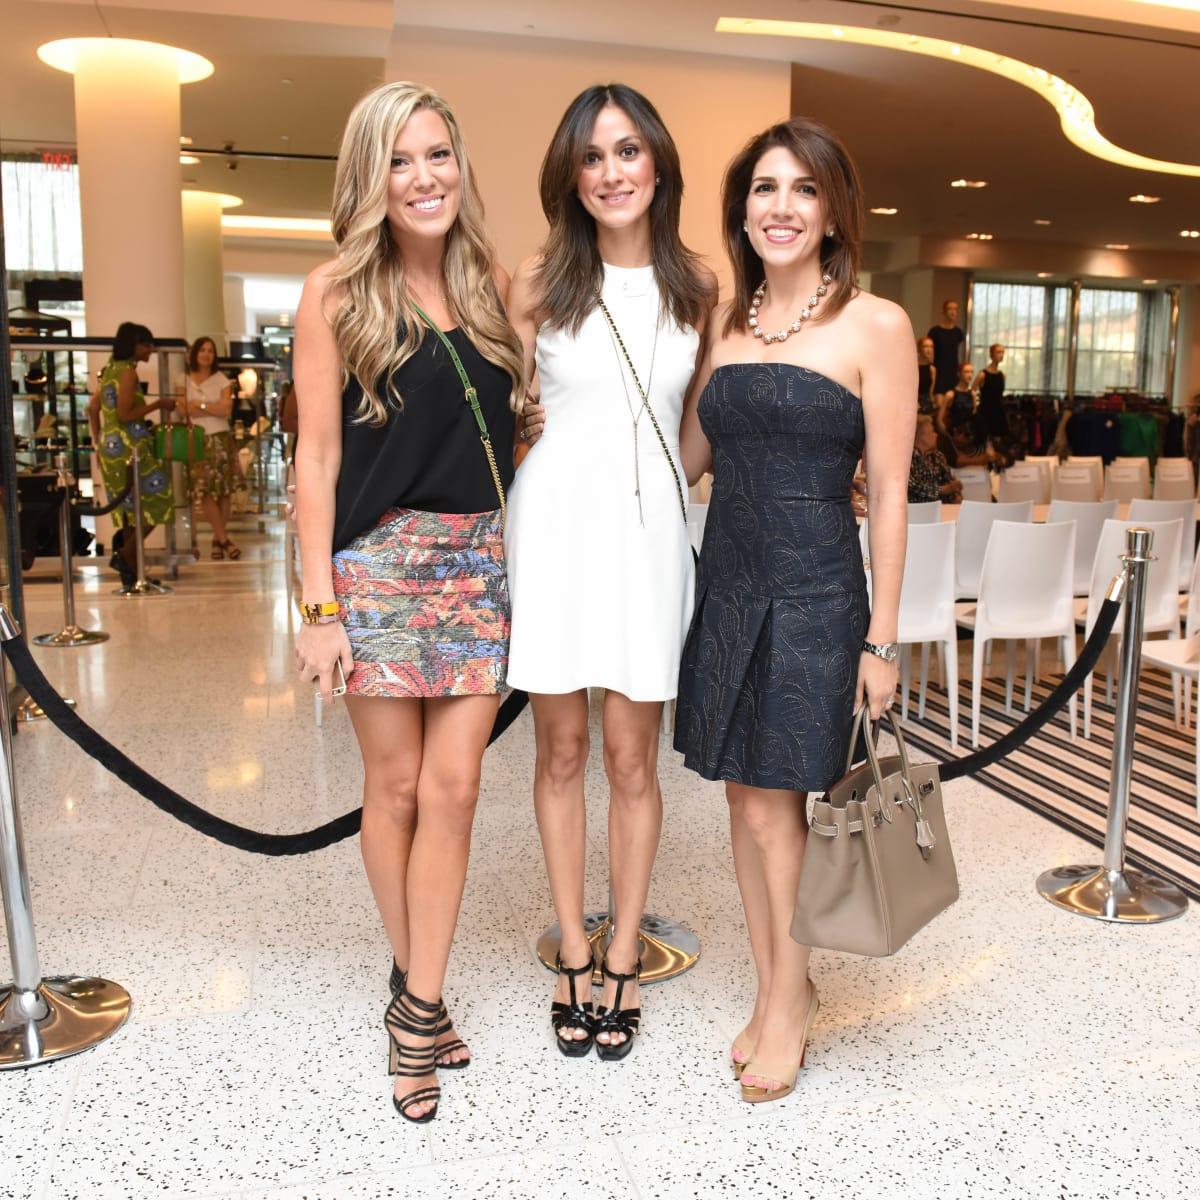 News, Shelby, Fresh Faces of Fashion, Sept. 2015, Holly Alvis, Heidi Kashani, Neekie Kashani